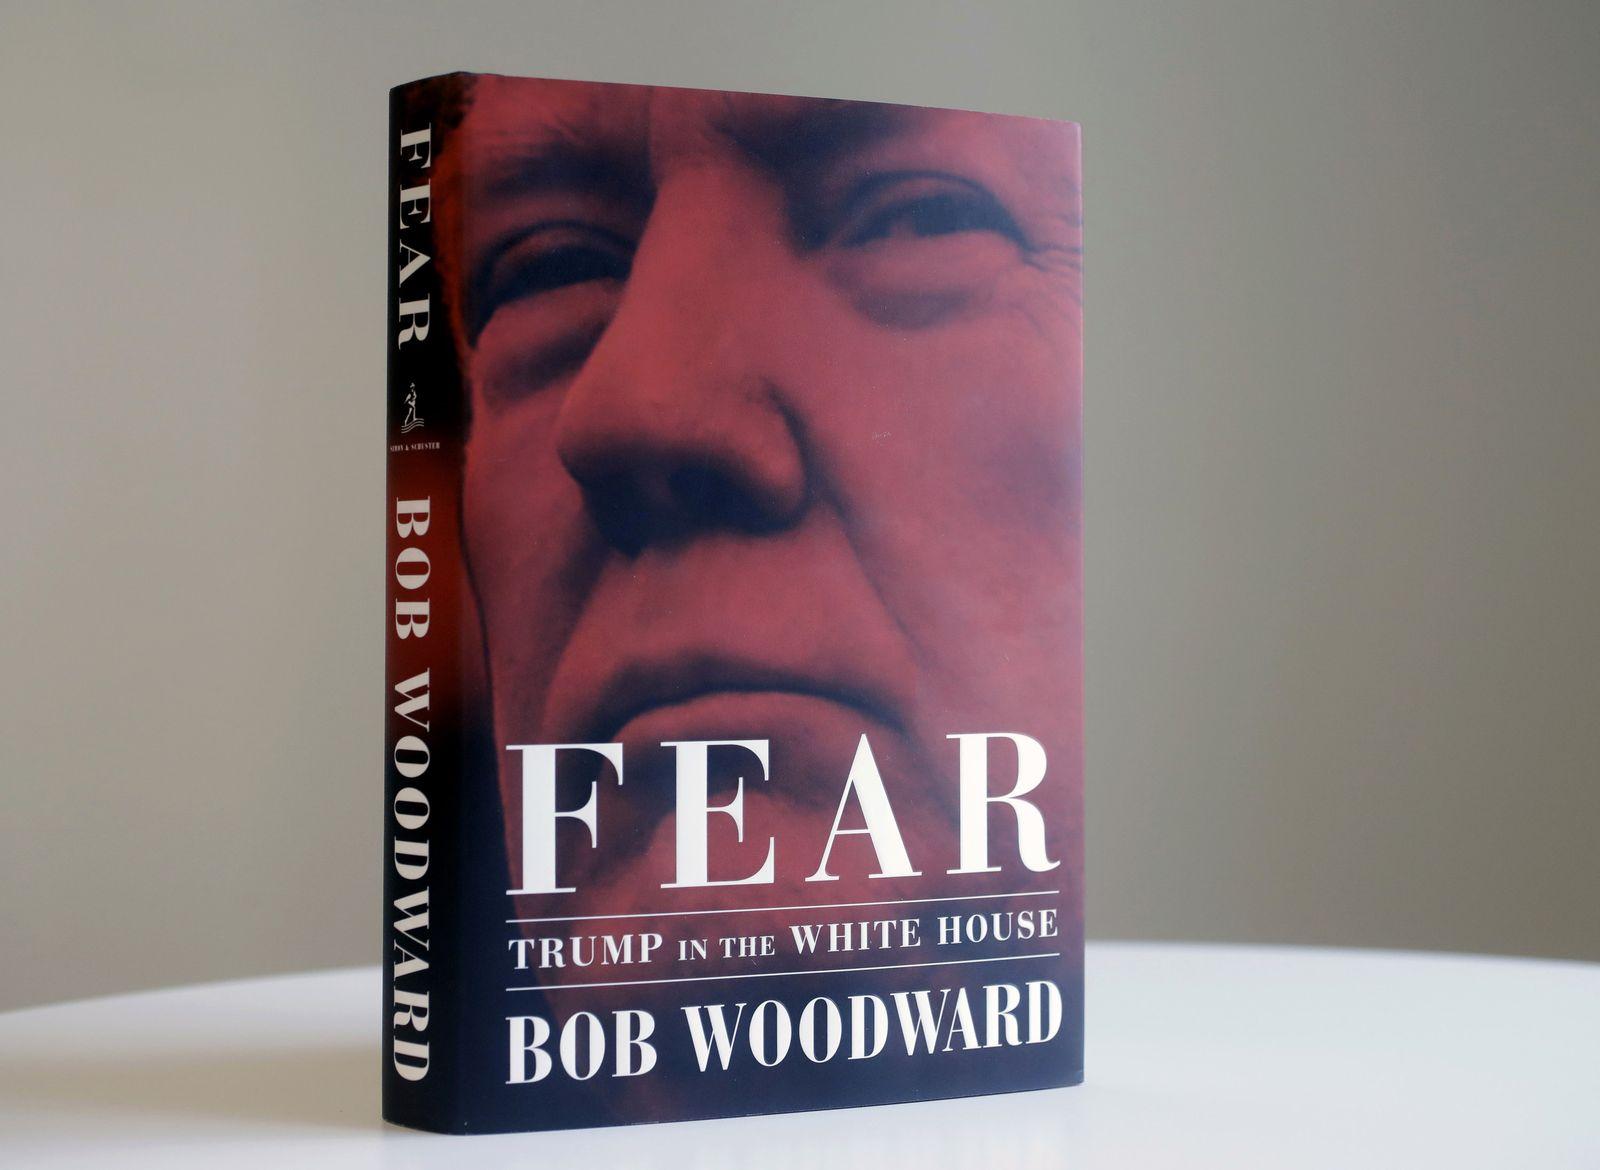 Fear Bob Woodward